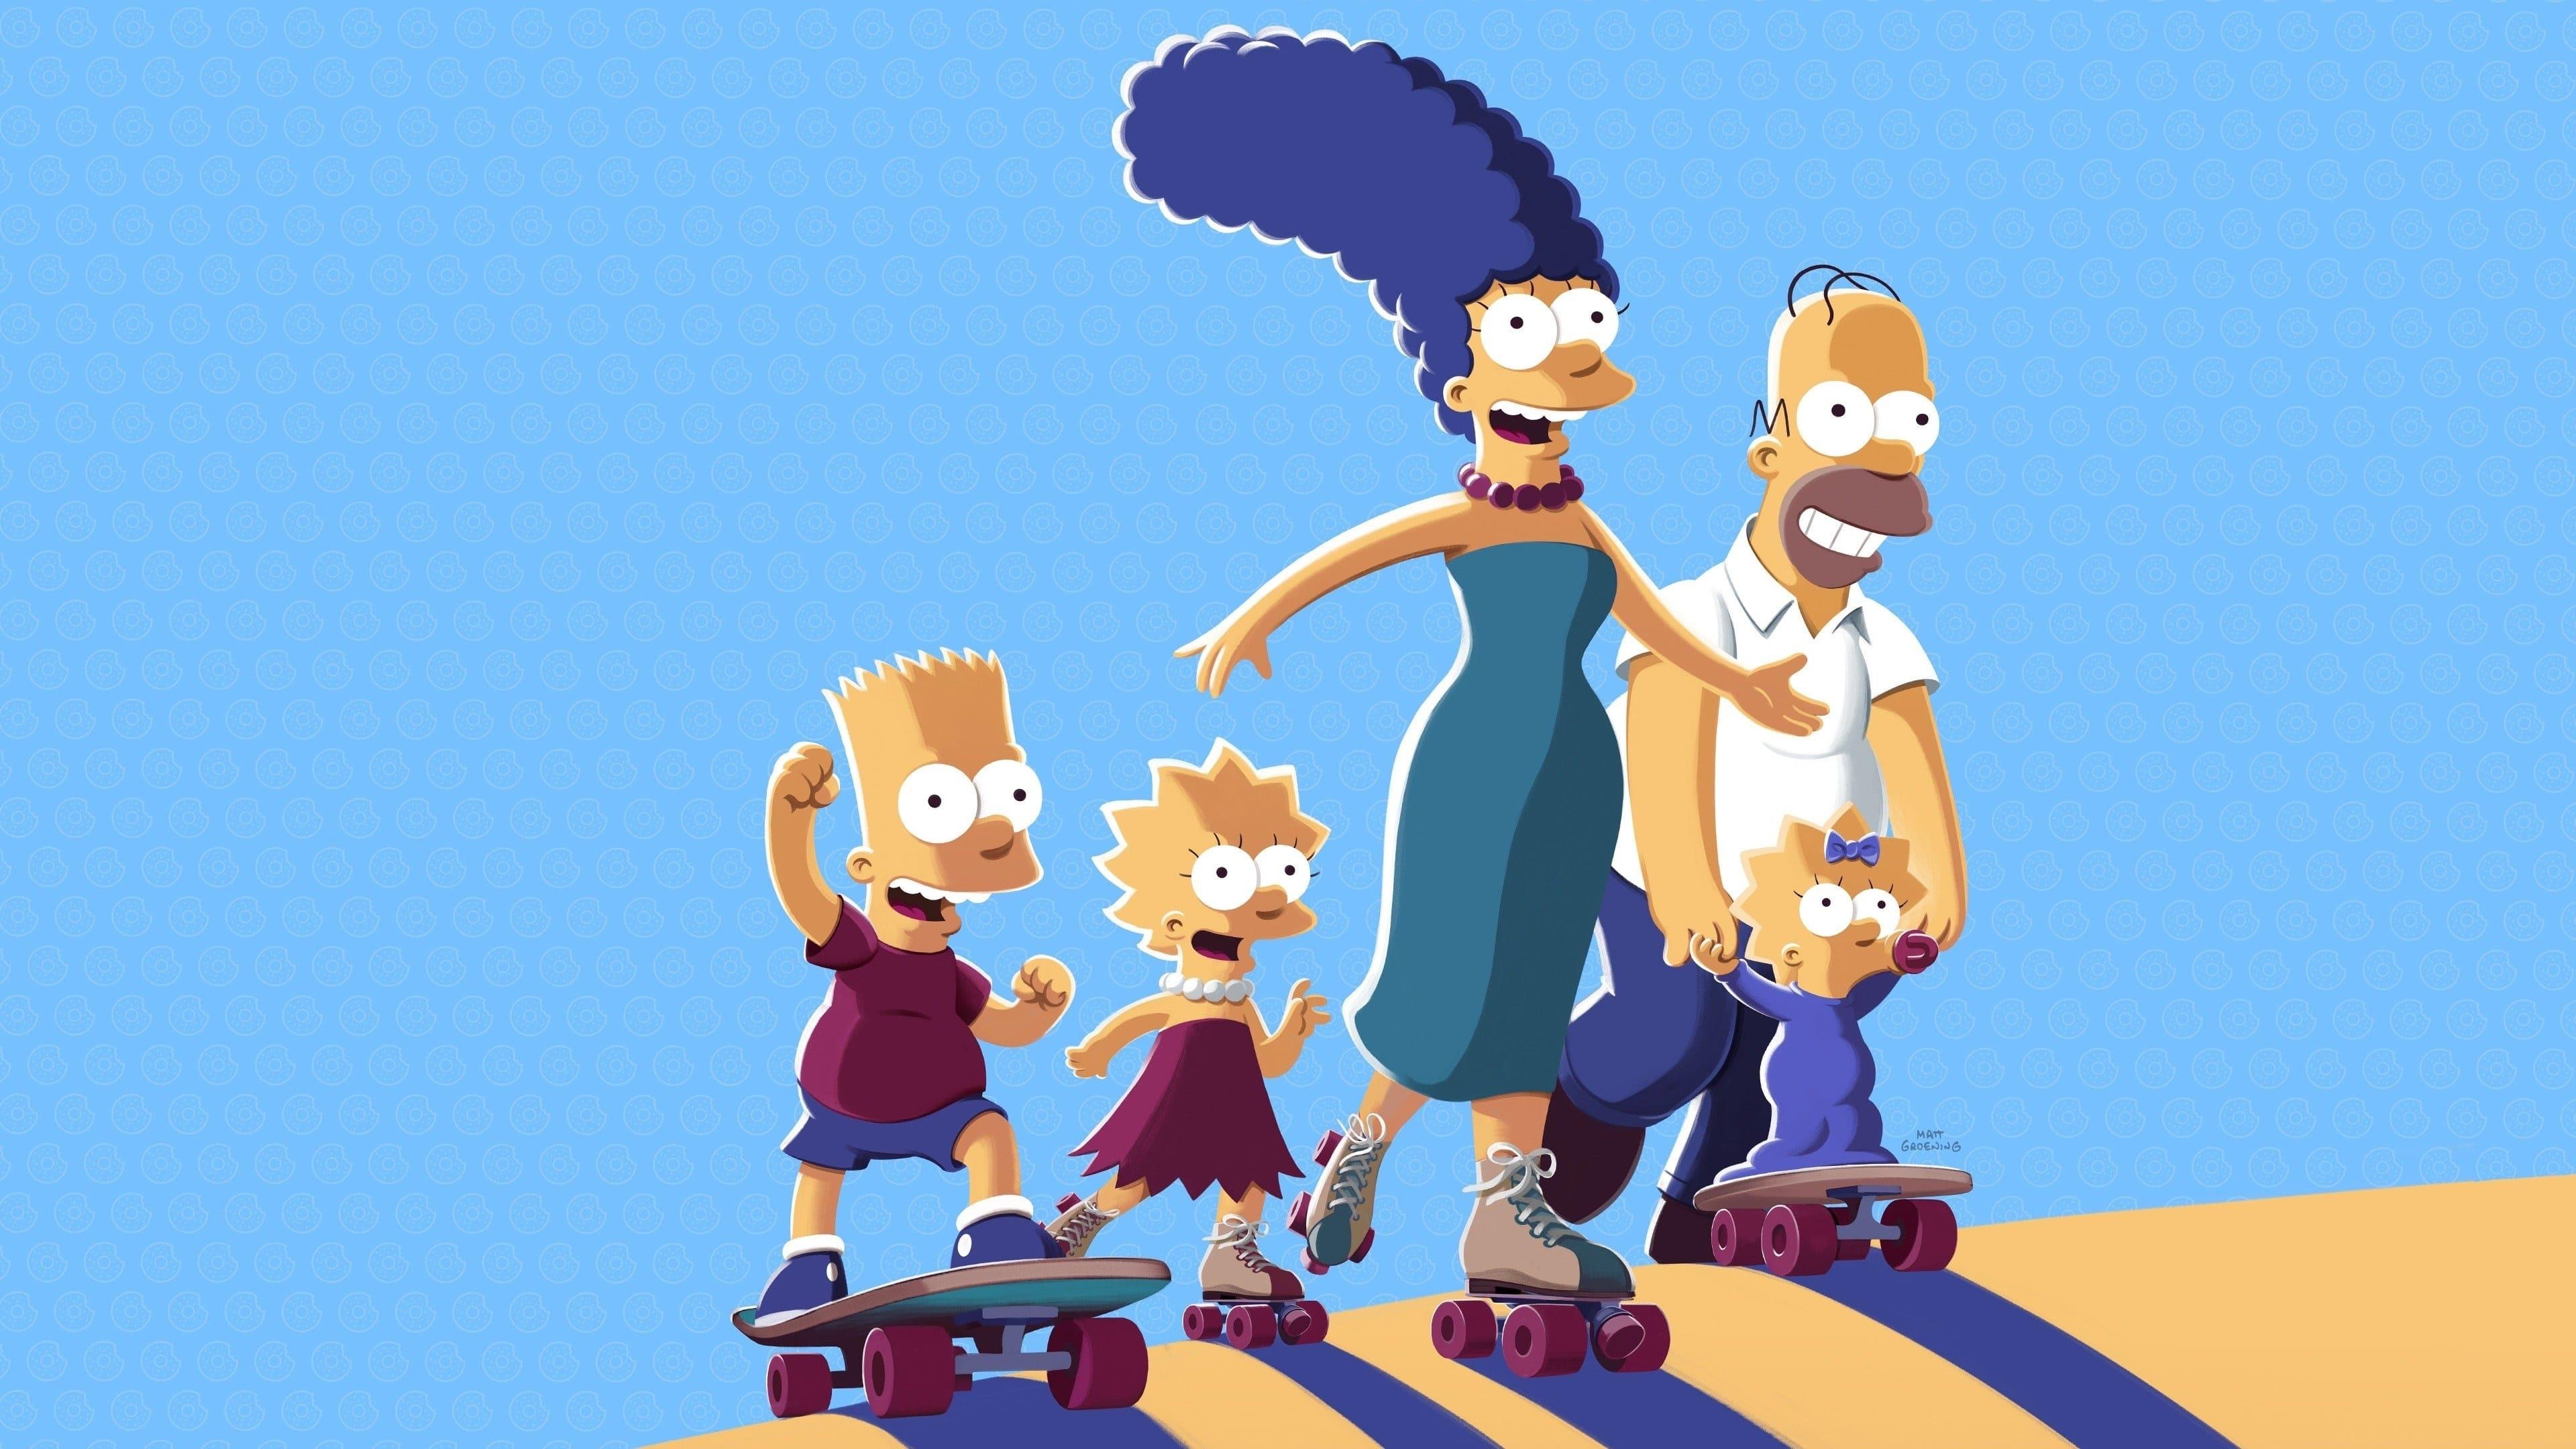 The Simpsons - Season 9 (1970)